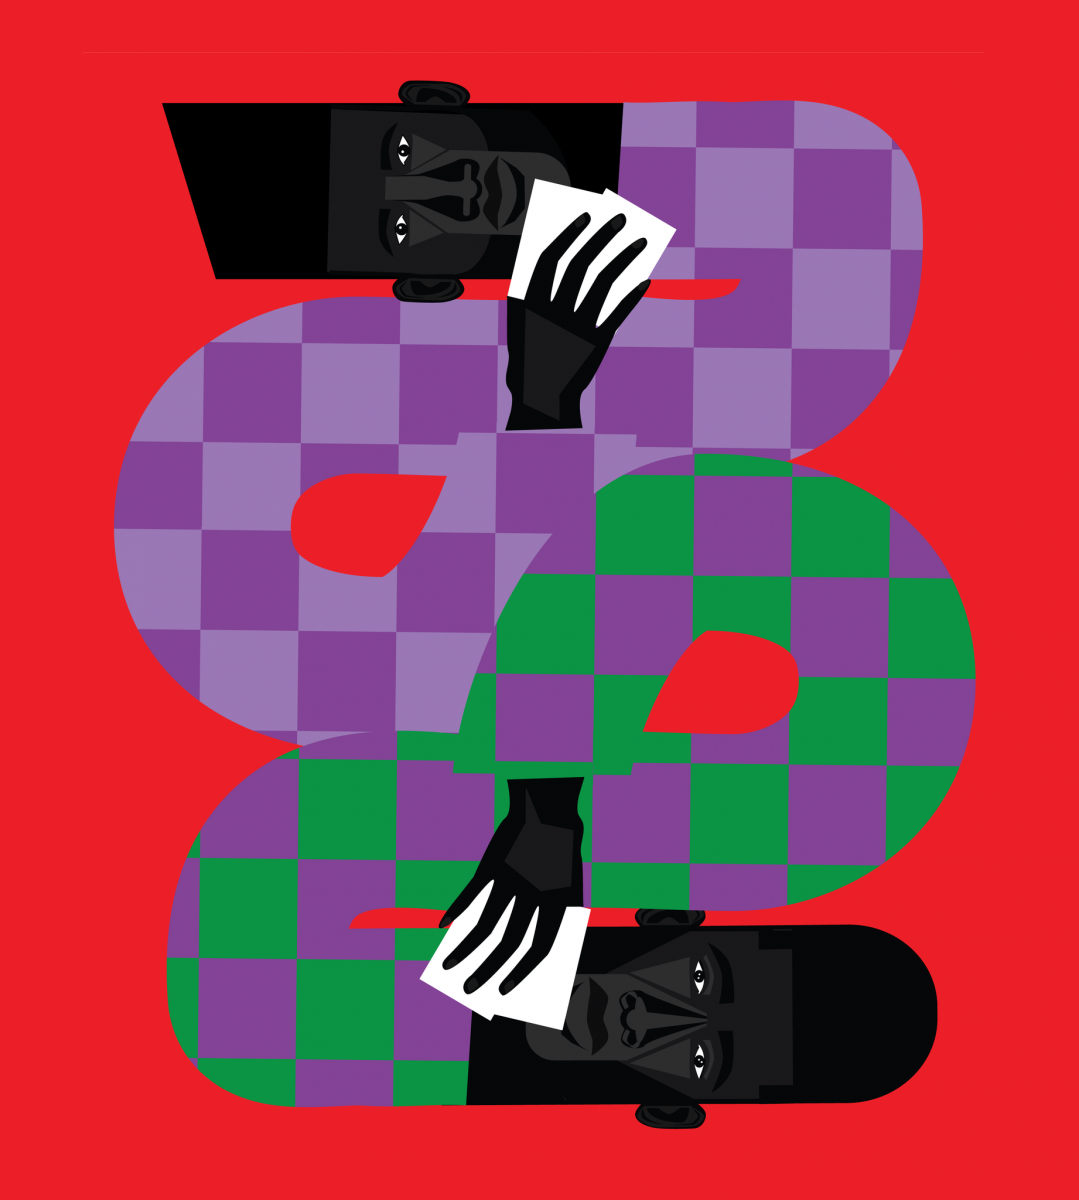 28Mag-Spades-1-superJumbo-v8